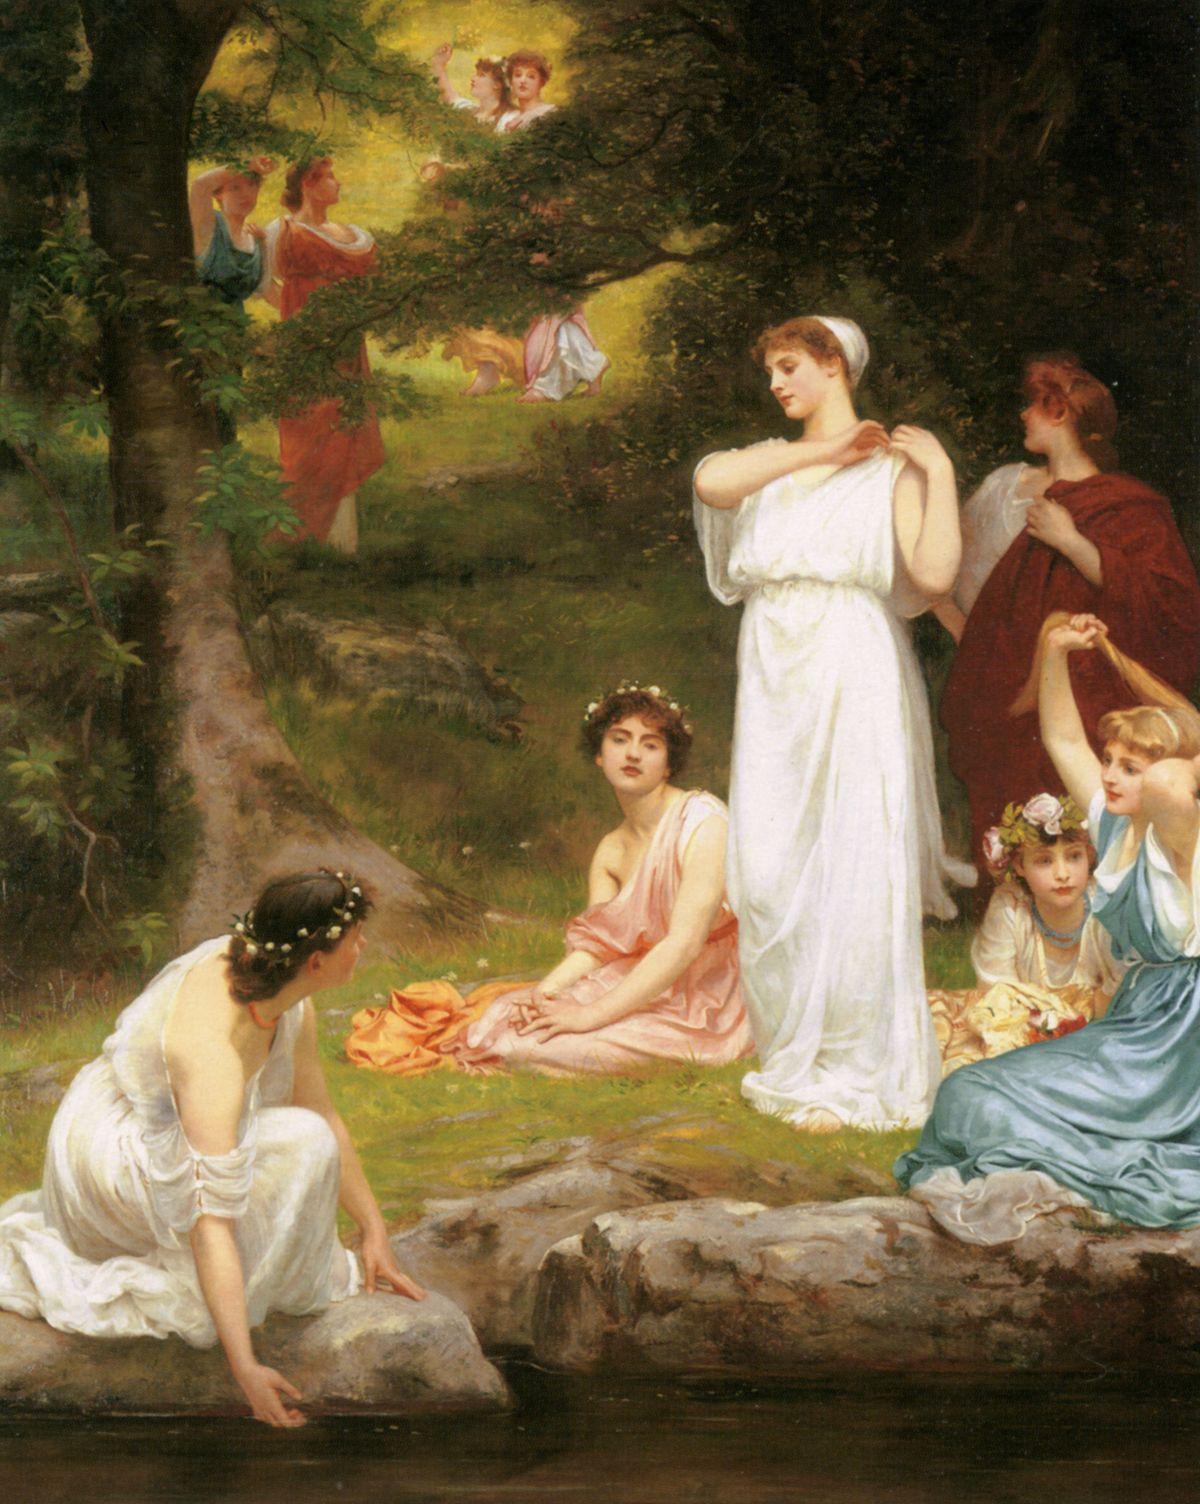 Joyous Summer by Philip Hermogenes Calderon